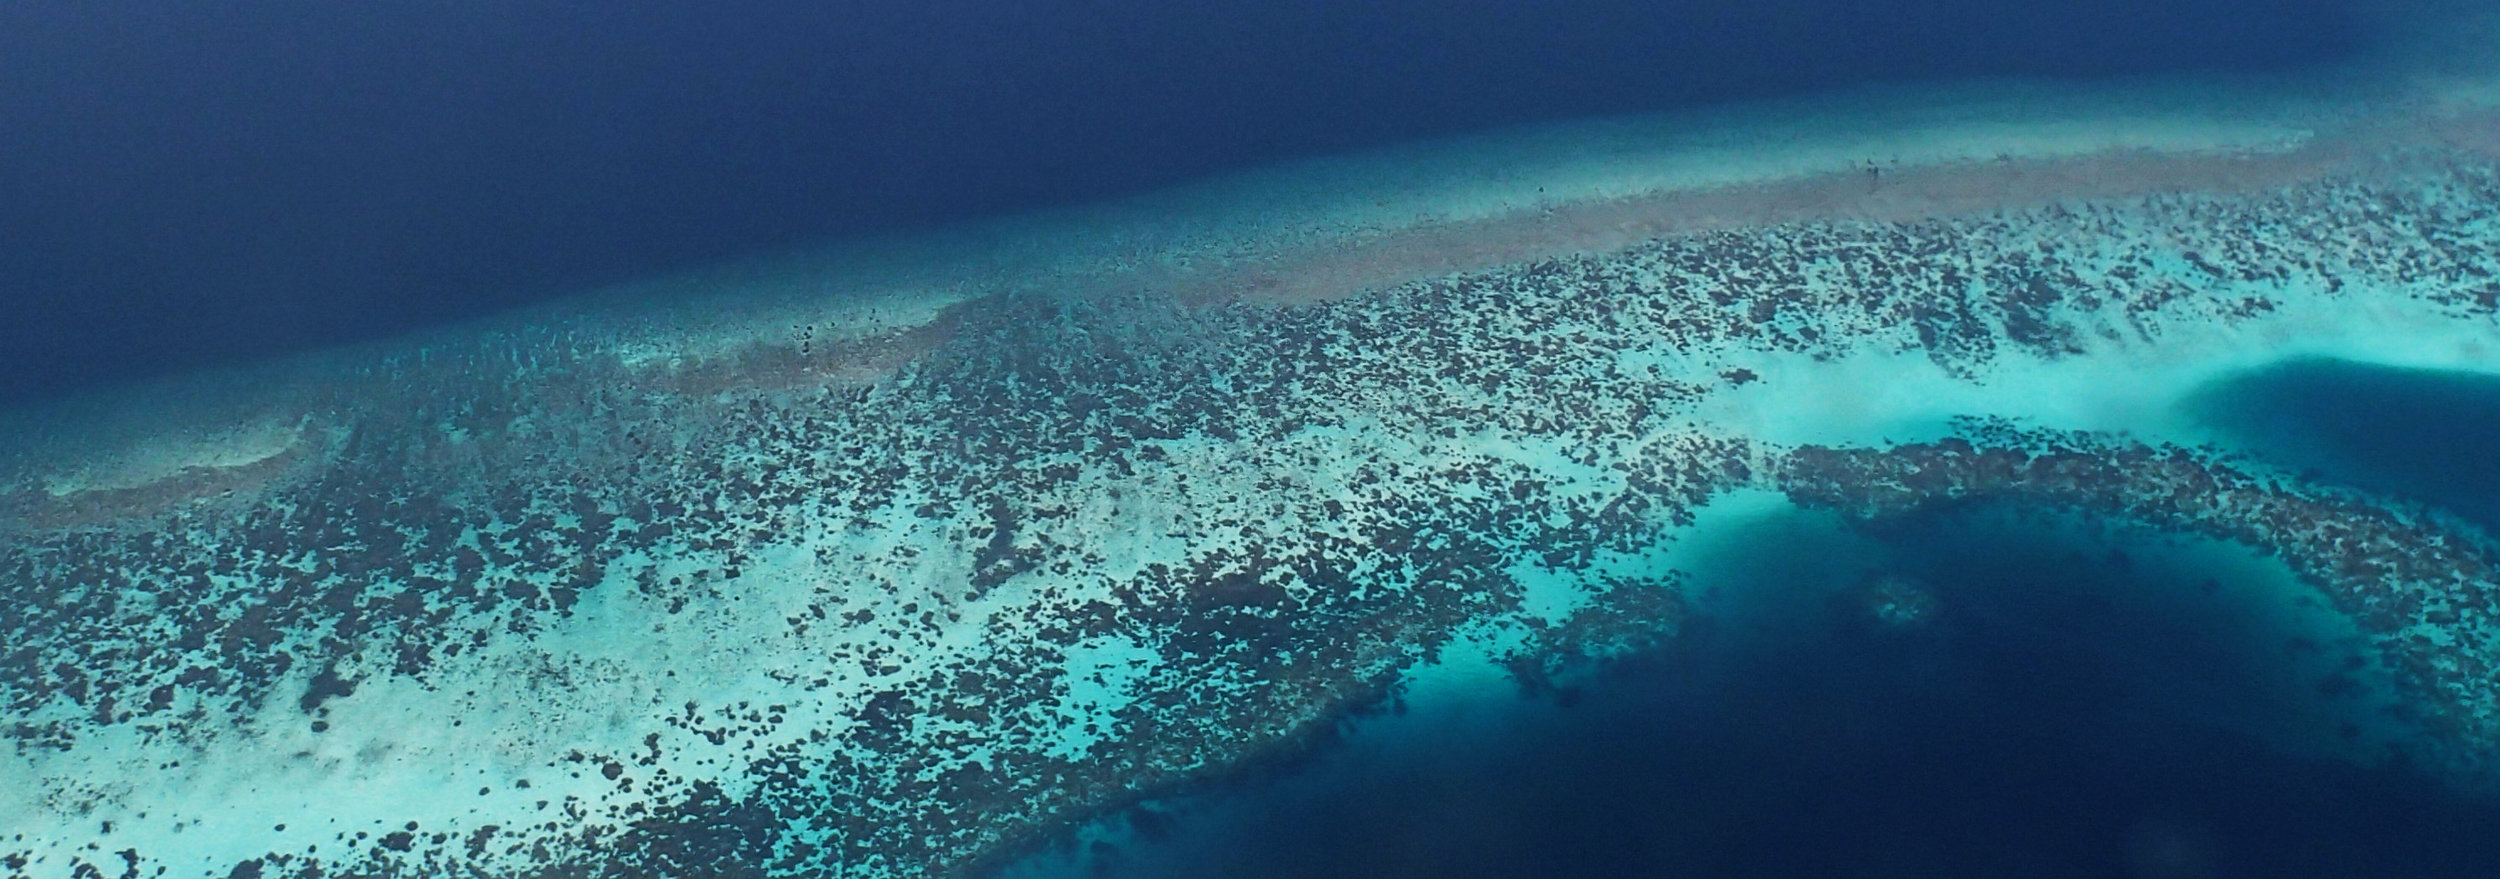 Maldivian reefs.jpg